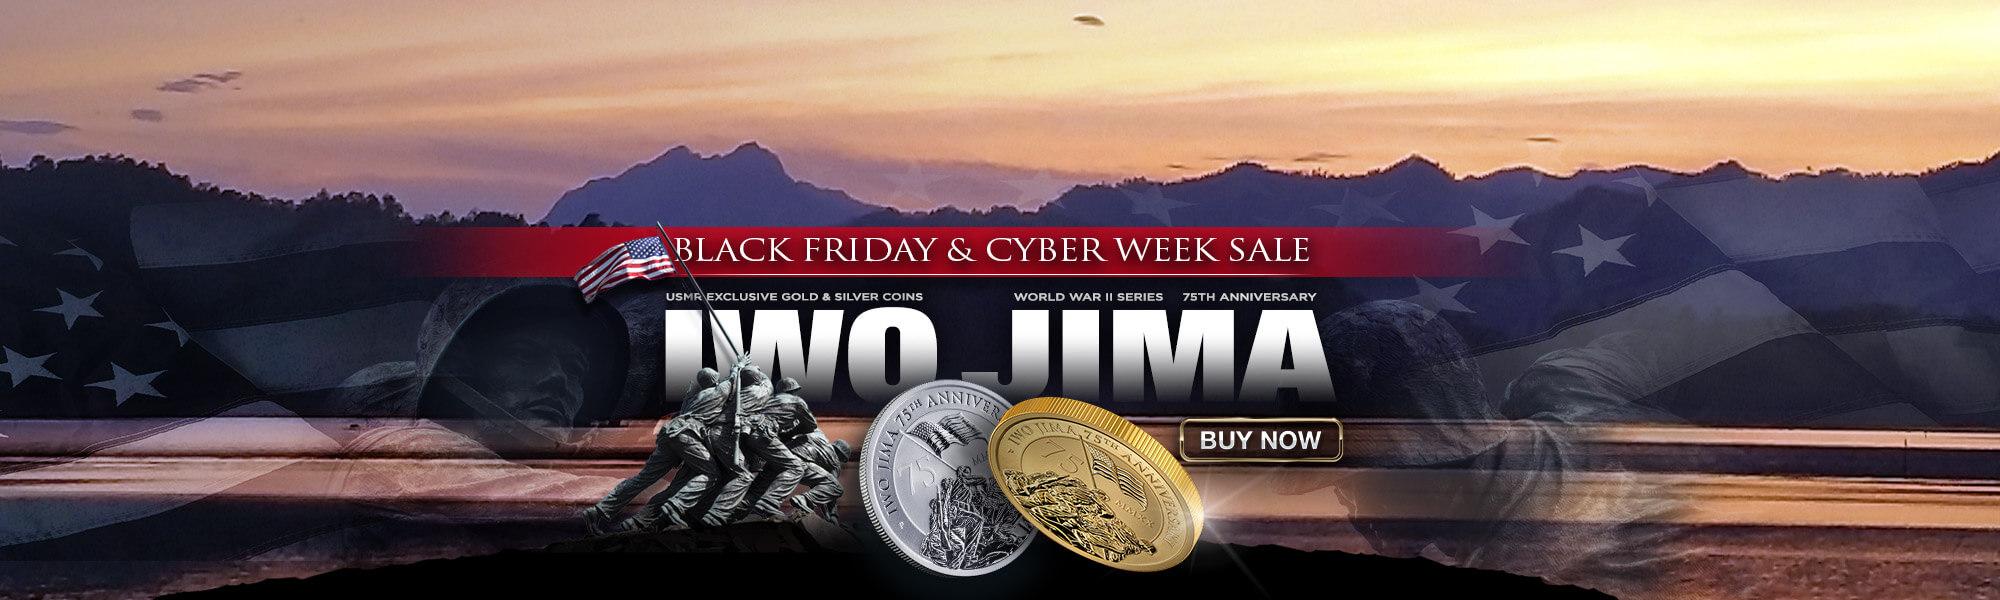 Black Friday Cyber Week Sale